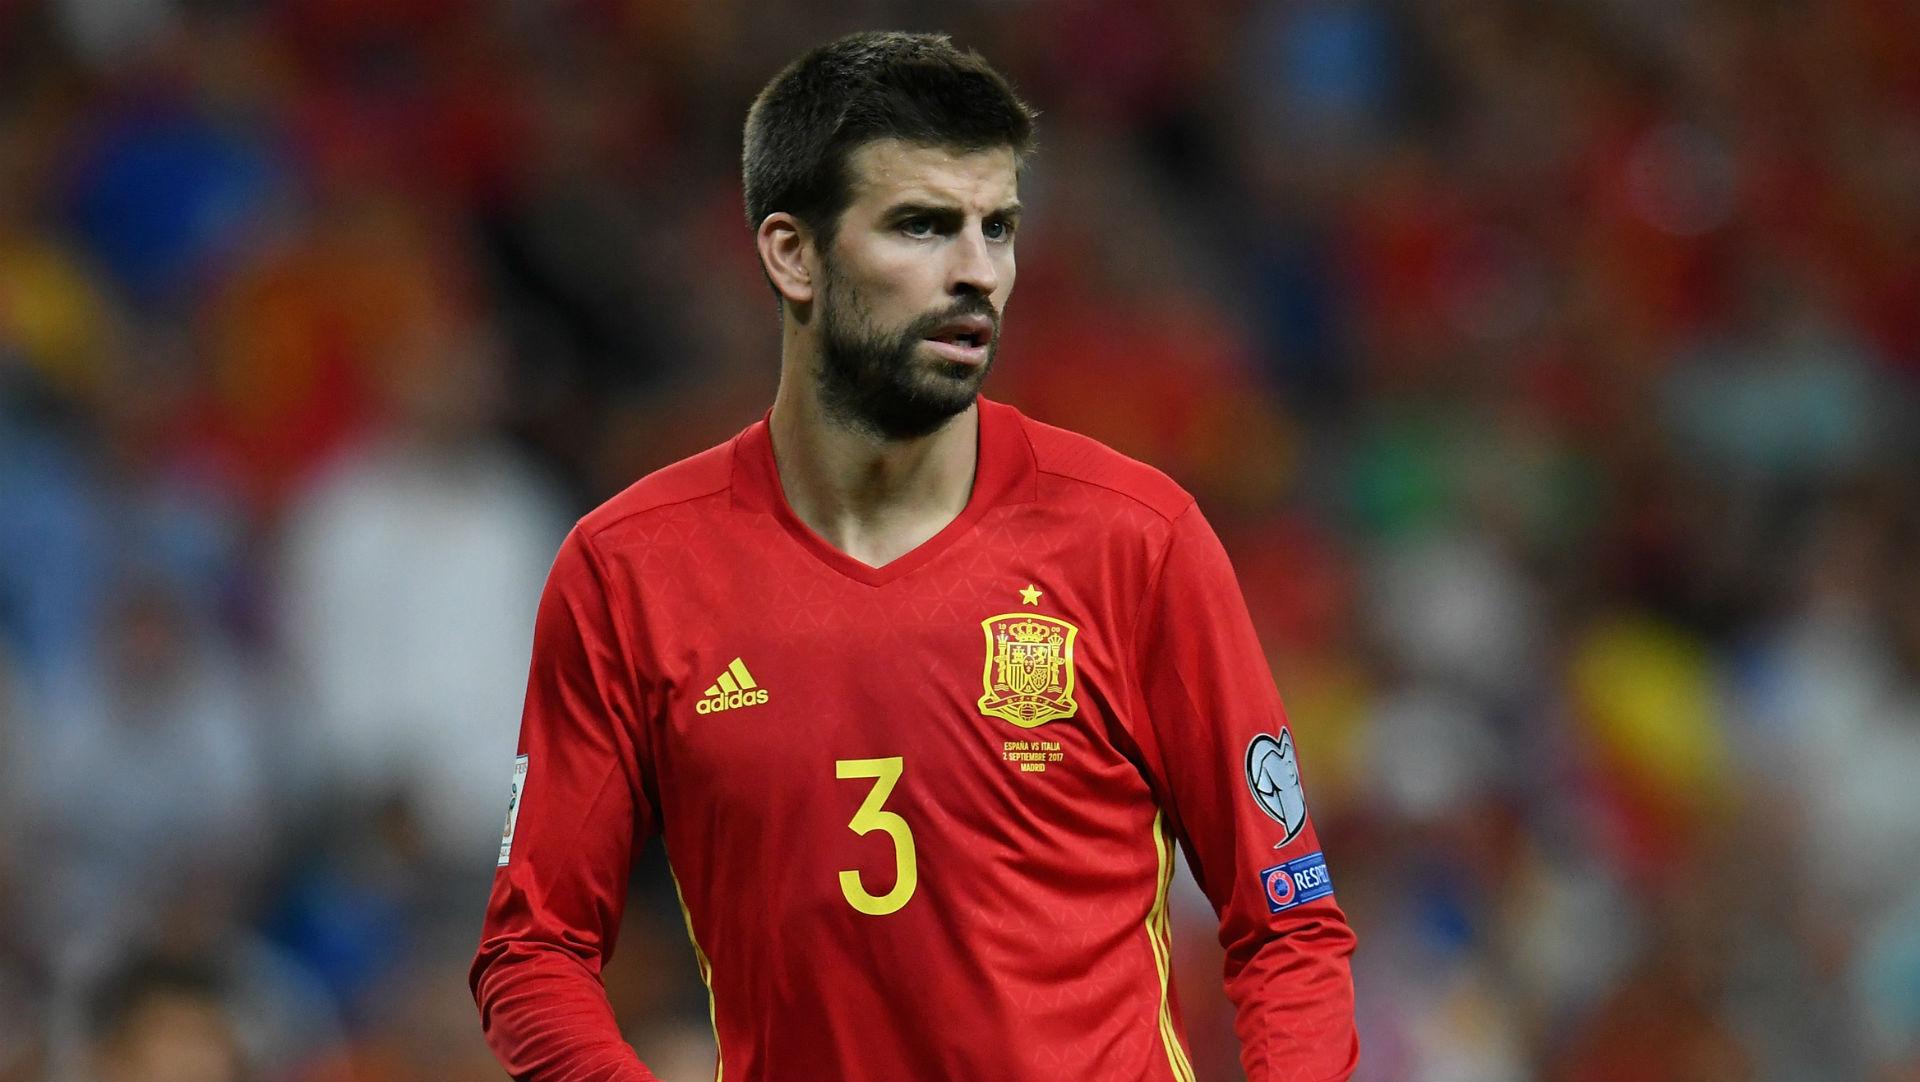 Image result for ปิเก้ประกาศอำลาทีมชาติสเปน